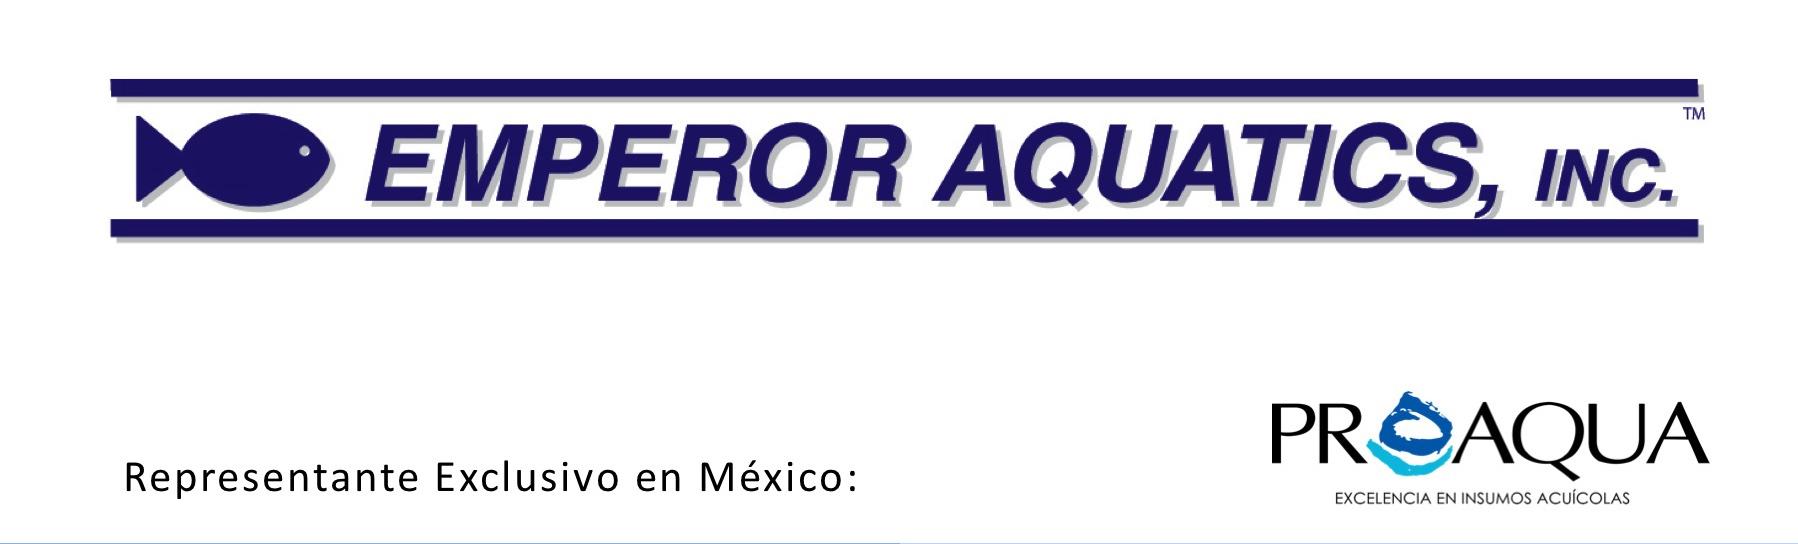 emperor-aquatics-proaqua-mexico-uv-systems.jpg